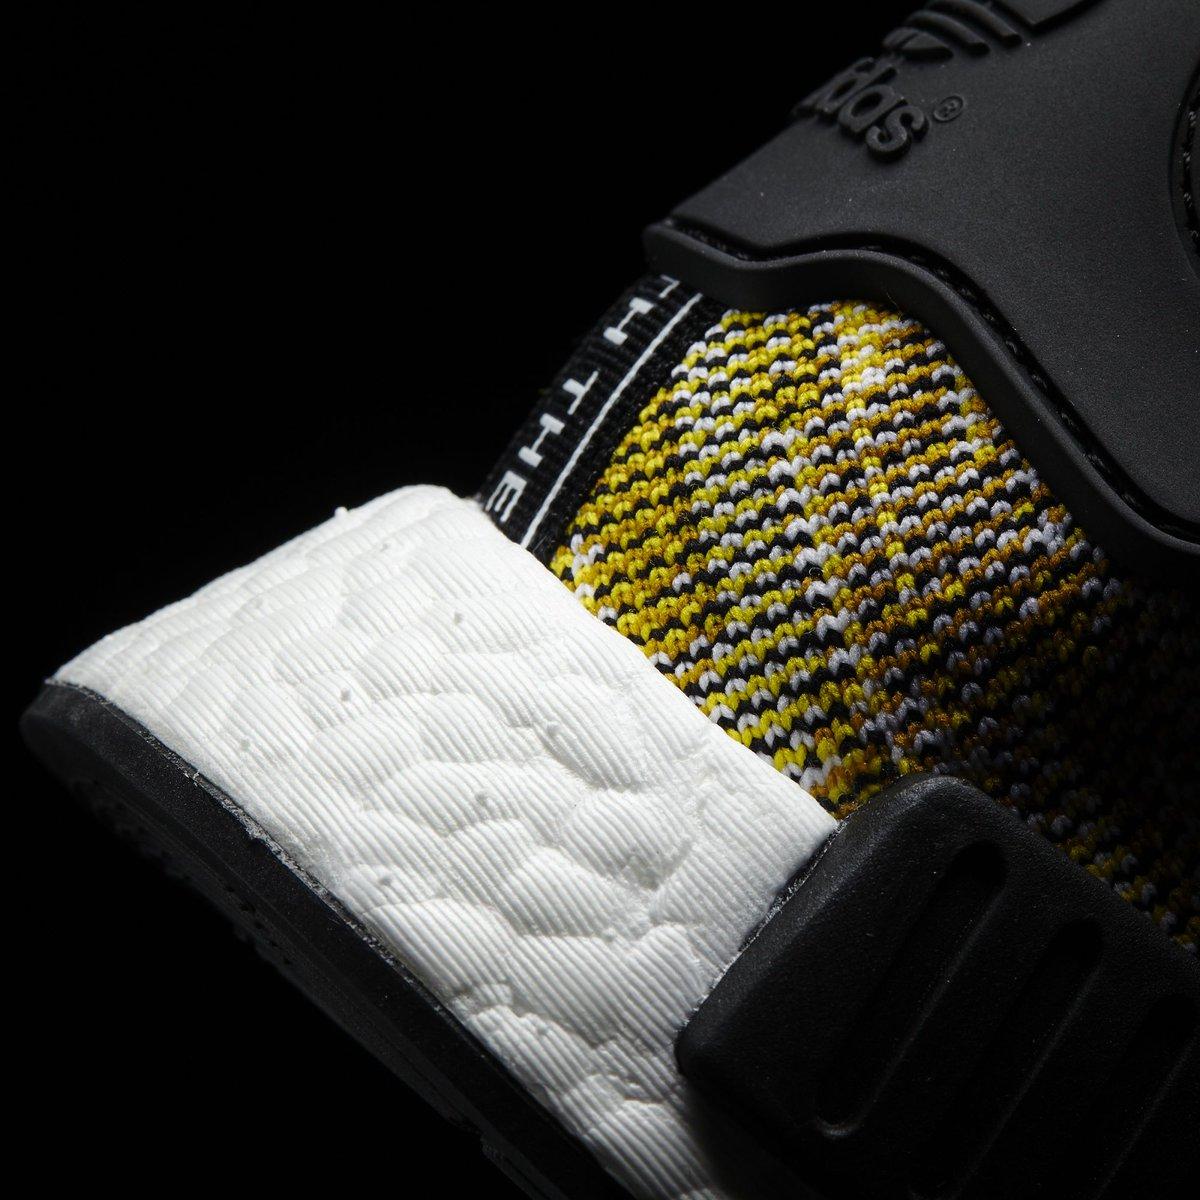 287253c85 Adidas NMD Runner Primeknit Core Black Nomad Yellow Releasing Saturday